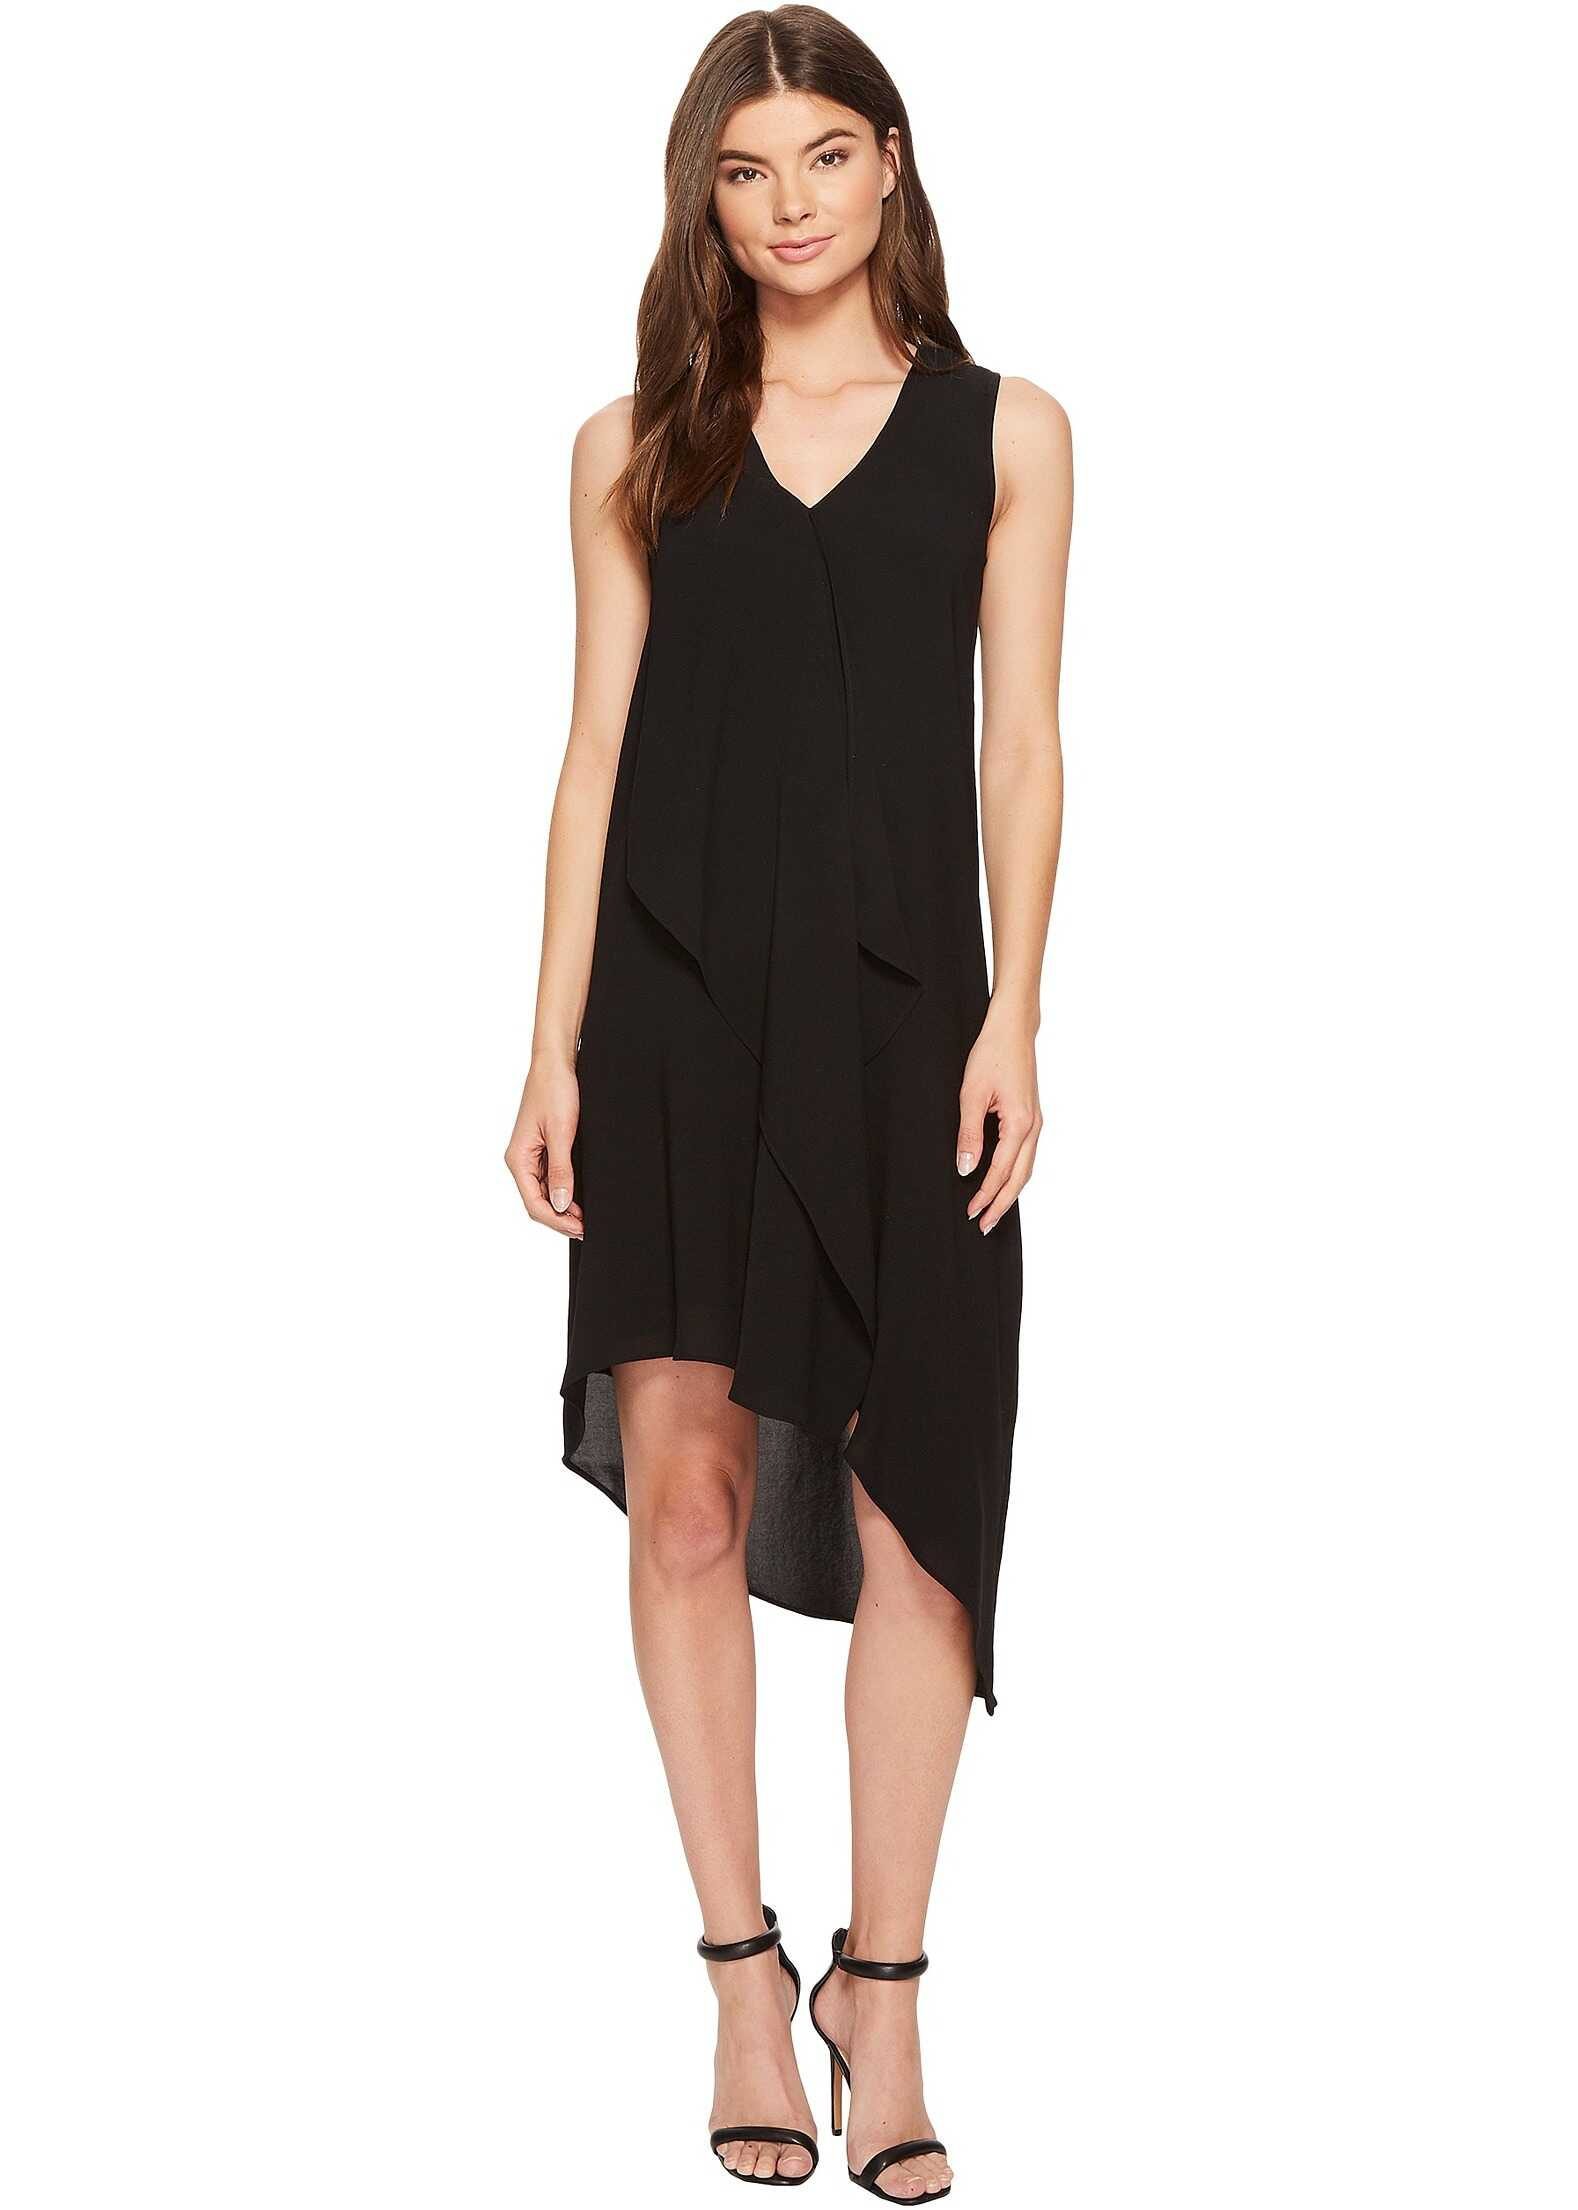 Adrianna Papell Asymmetrical Front Drape Dress Black 2